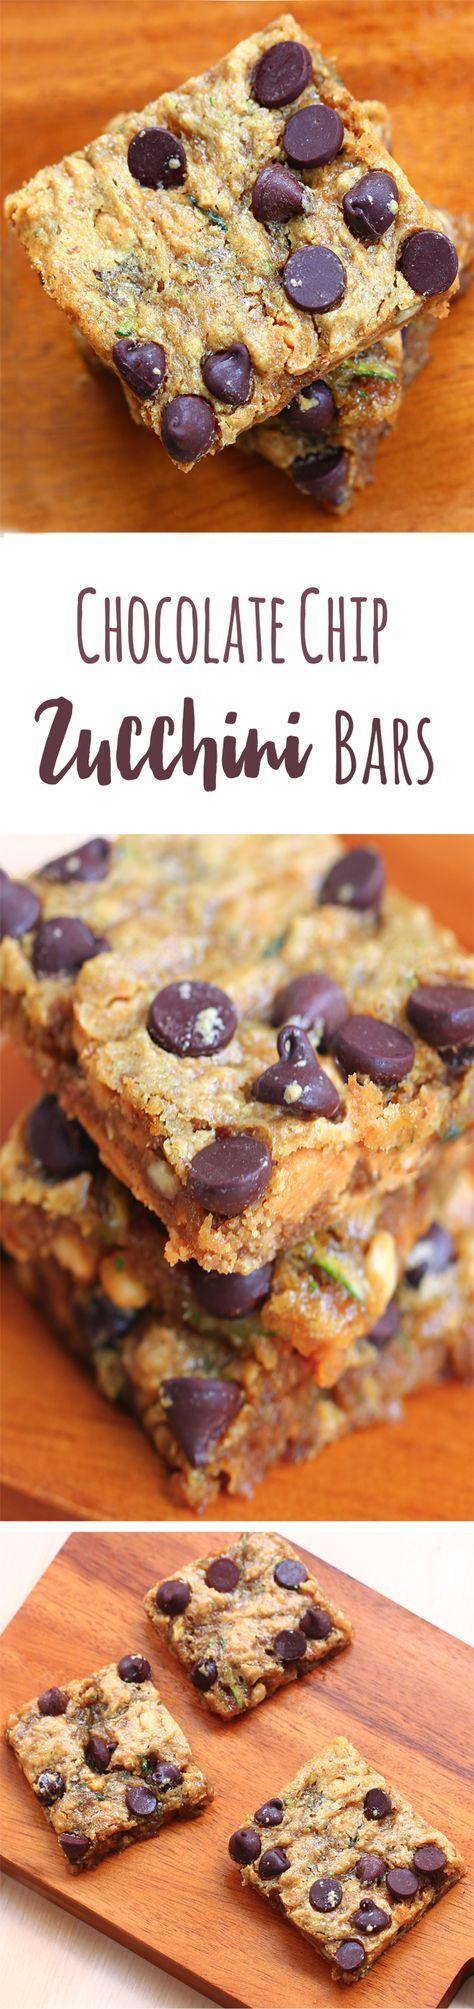 Chocolate Chip Zucchini Bars - Ingredients: 1 cup zucchini, 1/4 cup chocolate chips, 2 tsp vanilla, 1/2 tsp baking soda, 1 tbsp... Full recipe: http://chocolatecoveredkatie.com/2014/11/03/chocolate-chip-zucchini-bars/ @choccoveredkt